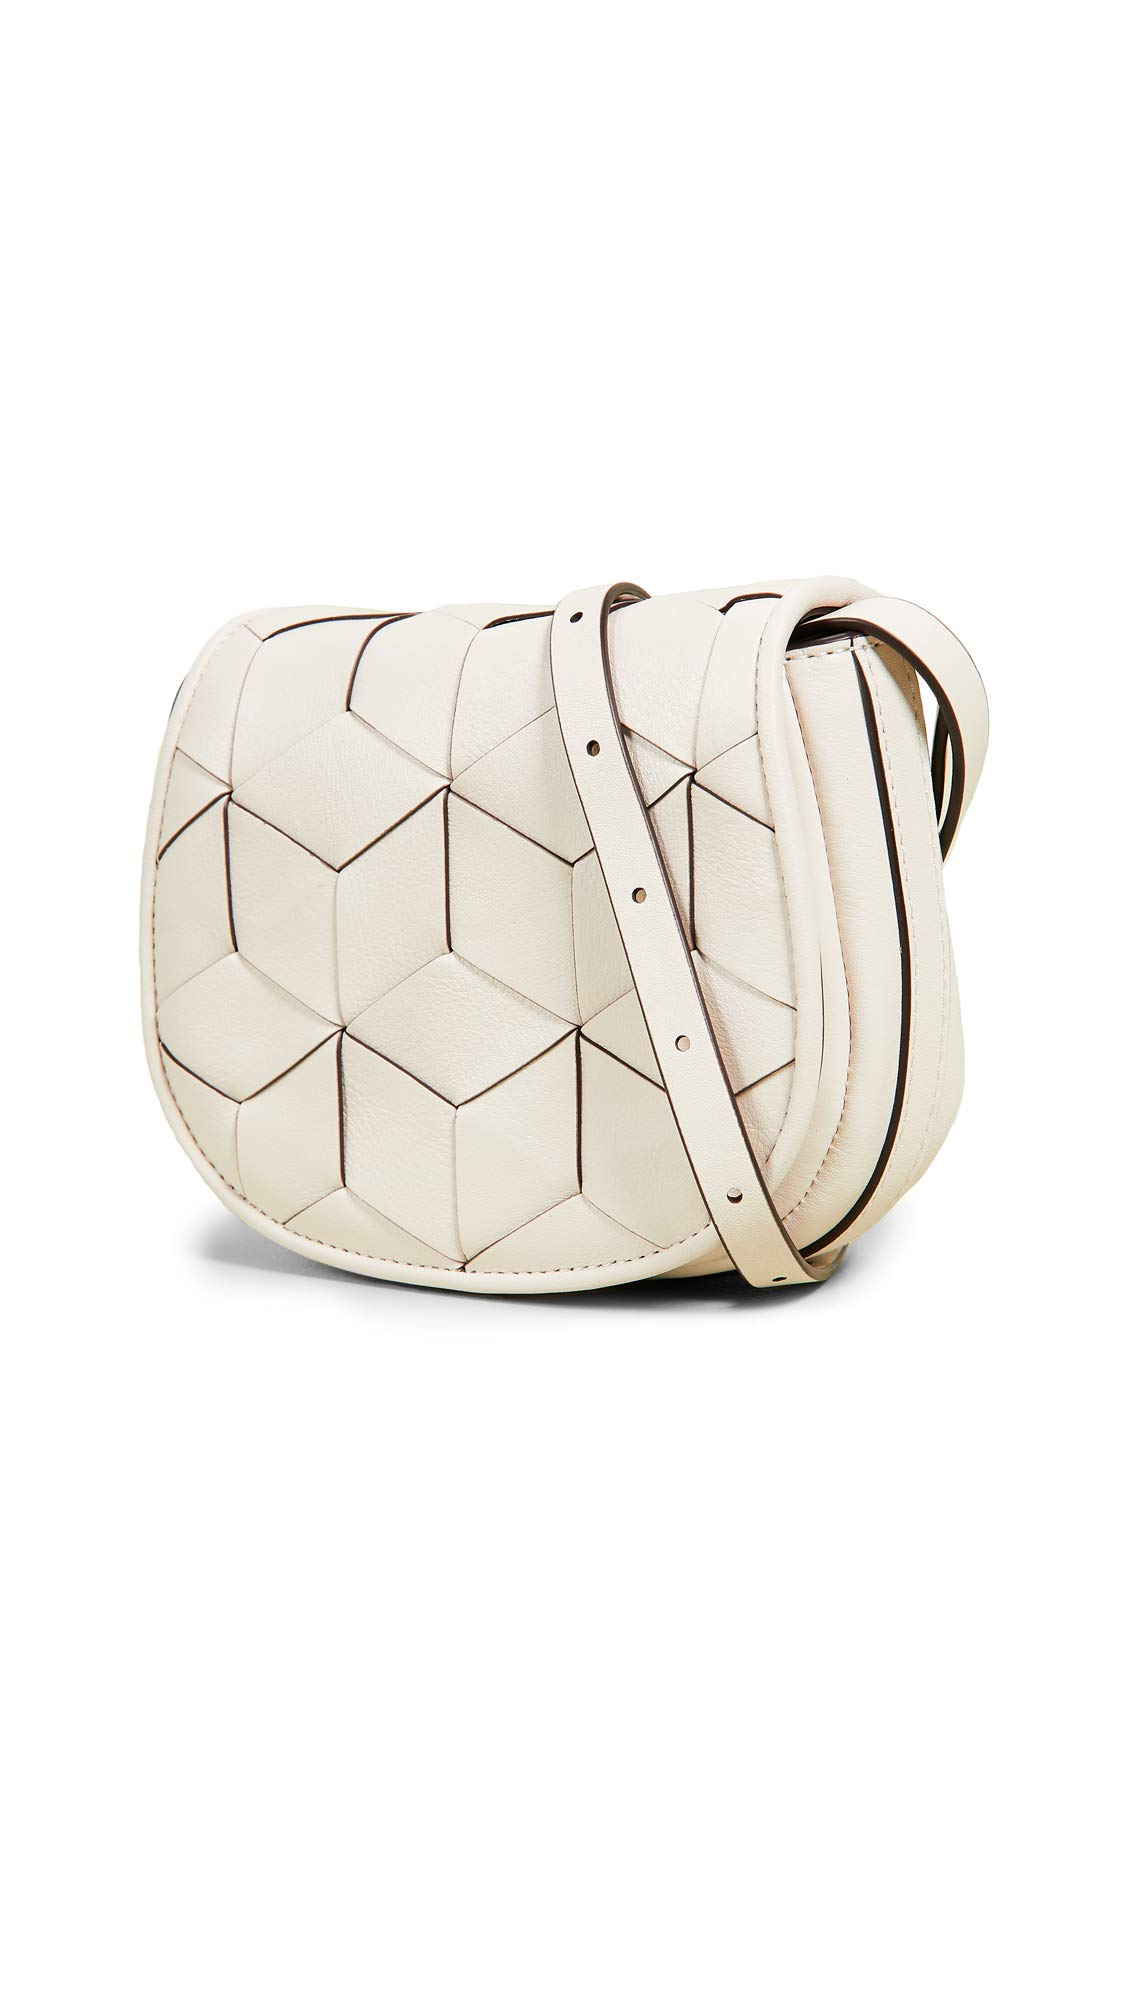 Welden Women's Mini Escapade Belt Bag, Chalk, Off White, One Size